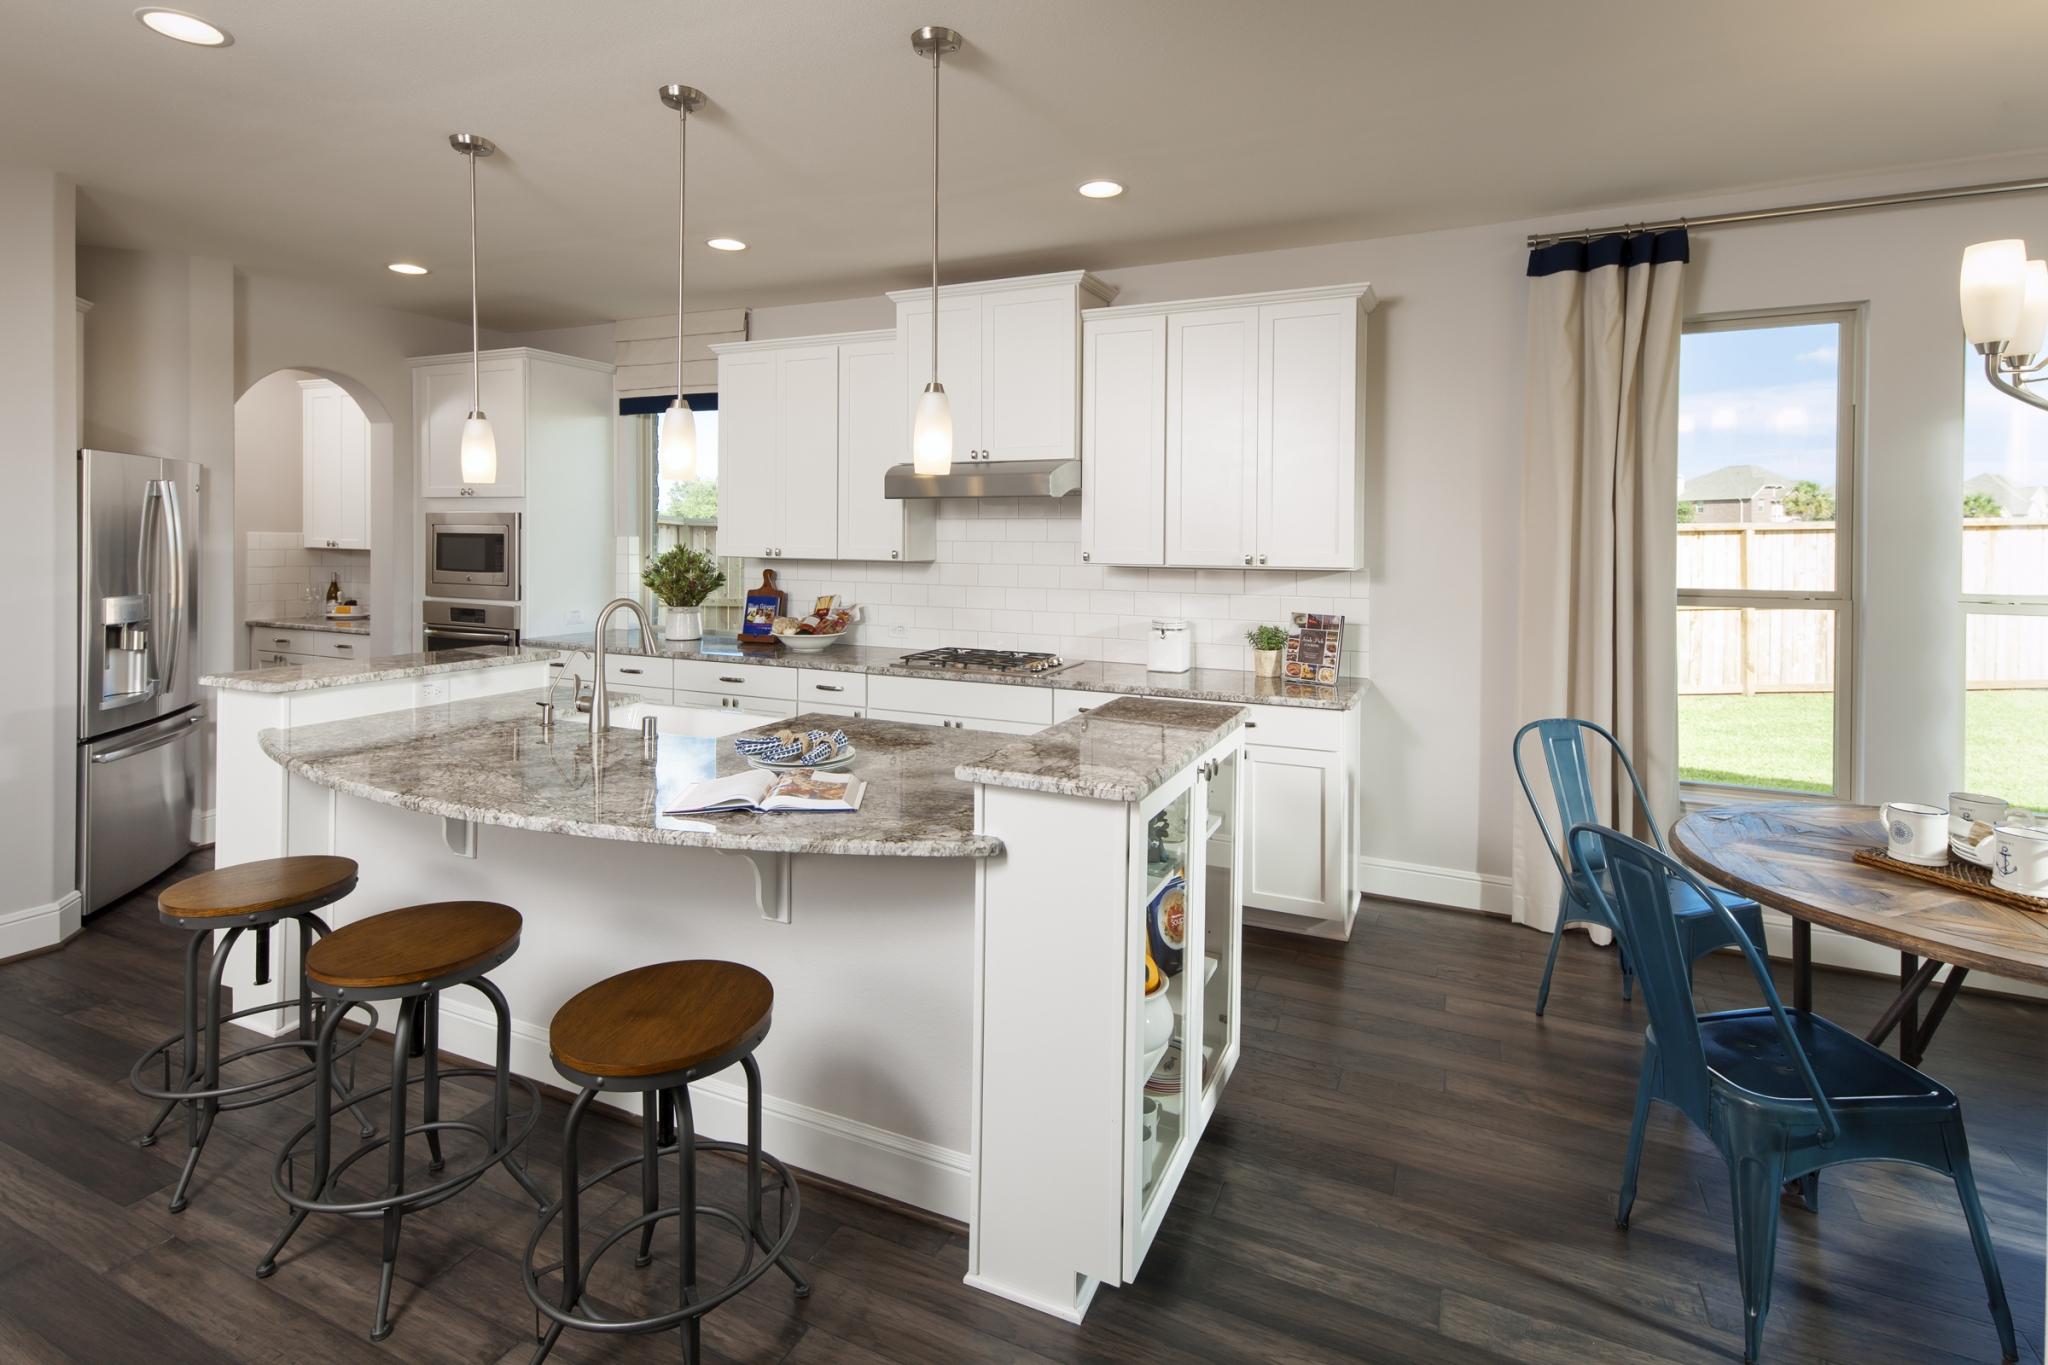 Johnson Development names builders in Veranda community - Houston ...